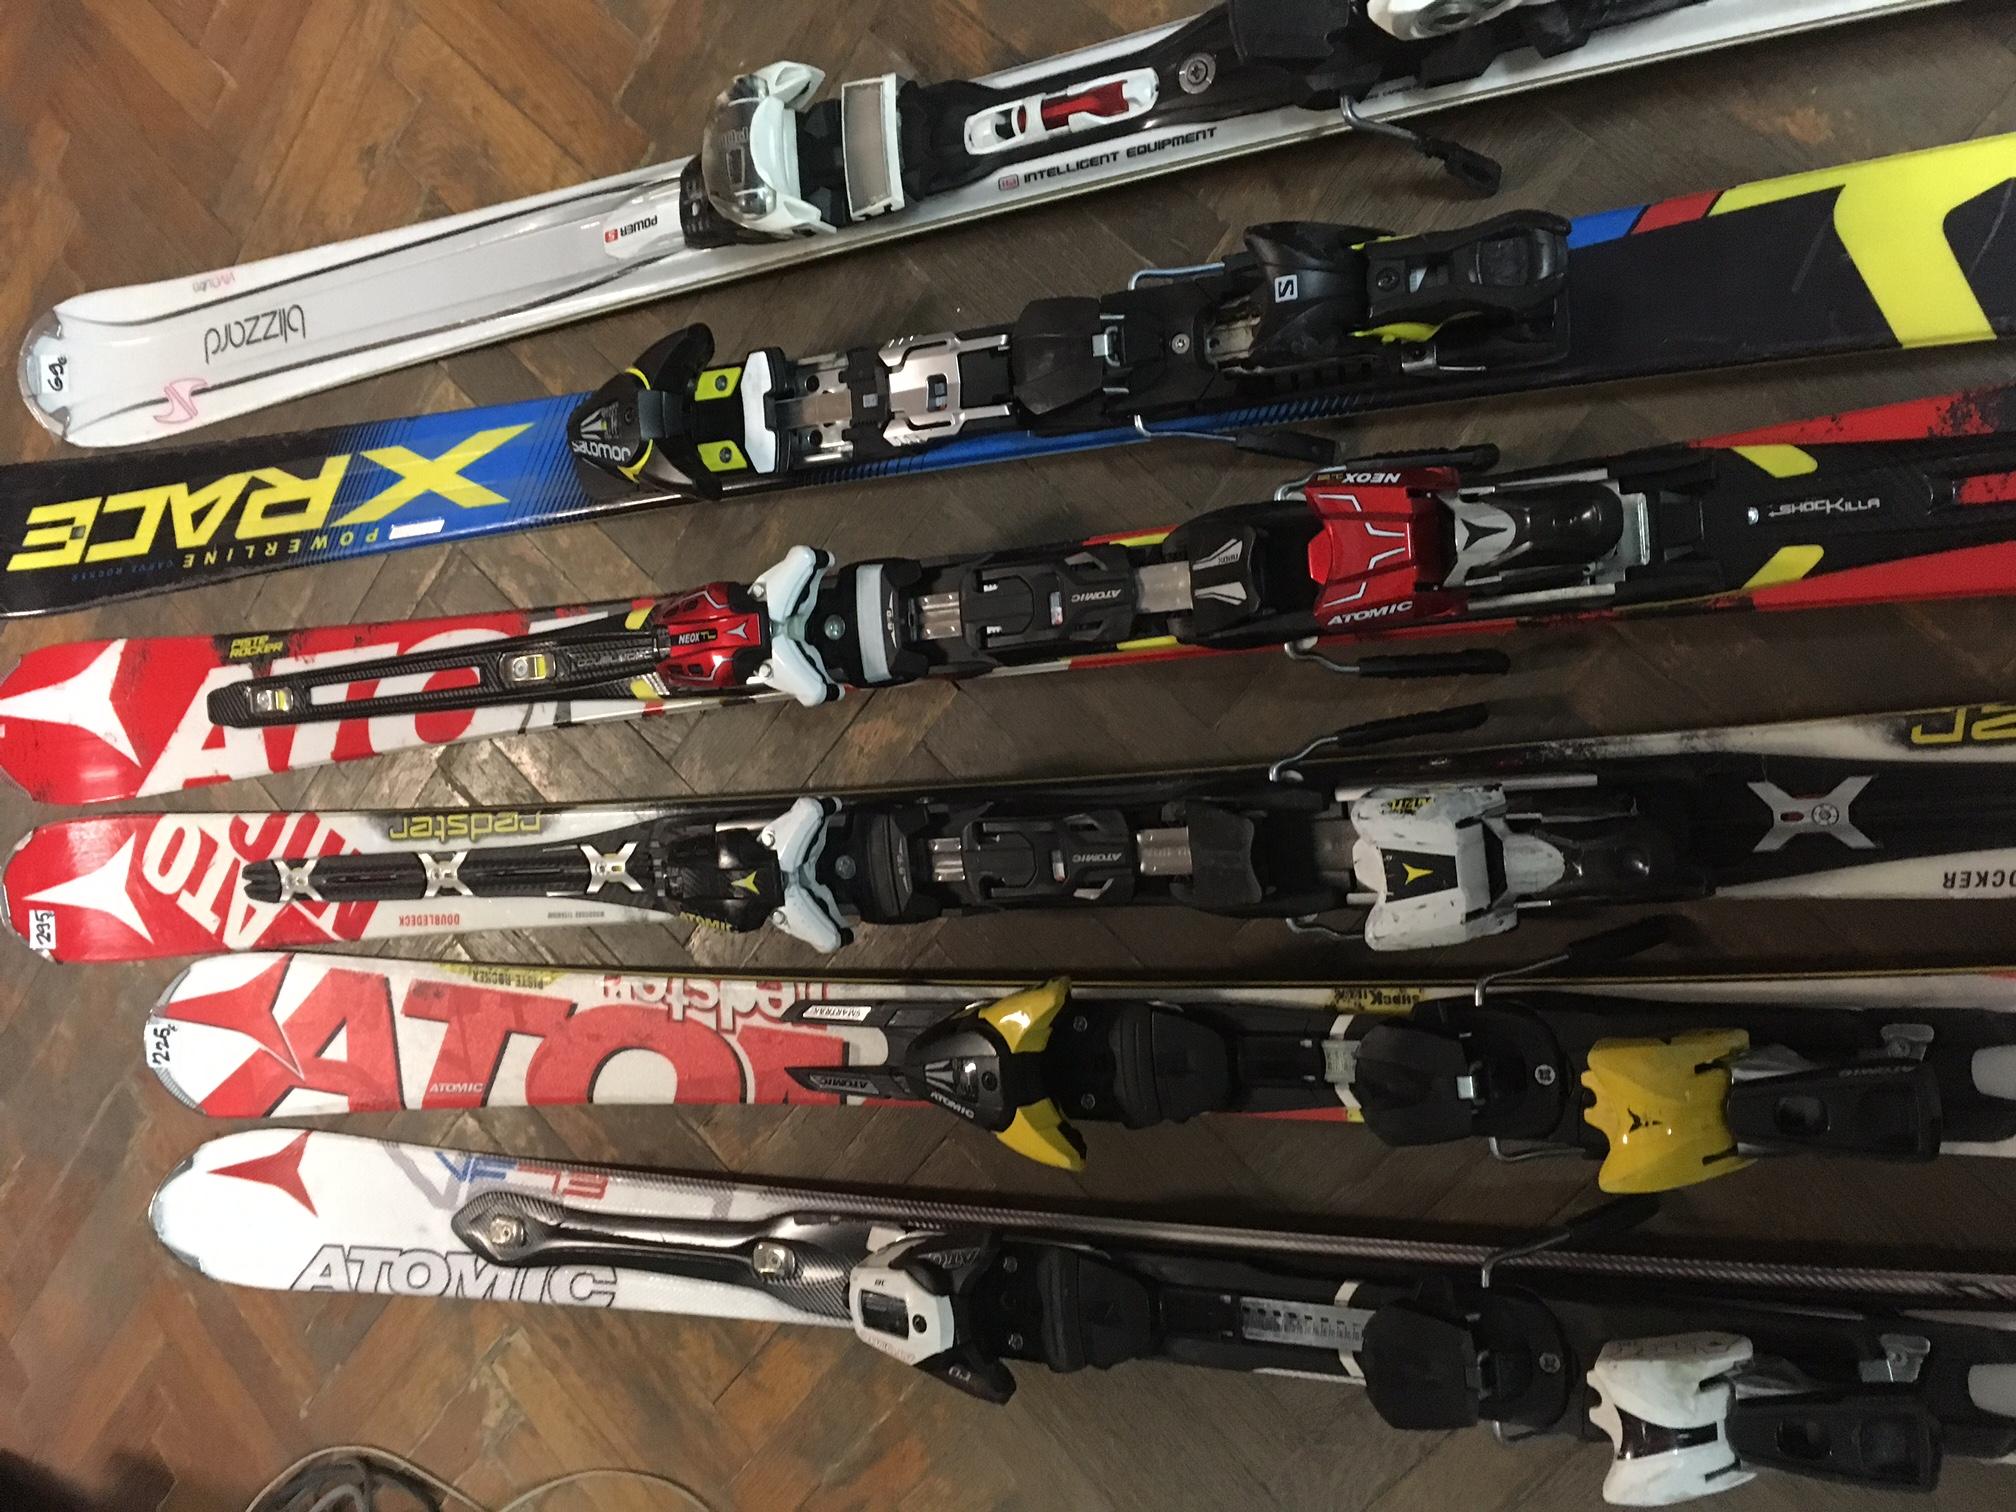 37b88da47d Požičovňa lyží a snowboarov - Forgi - Dovolenky - Zima